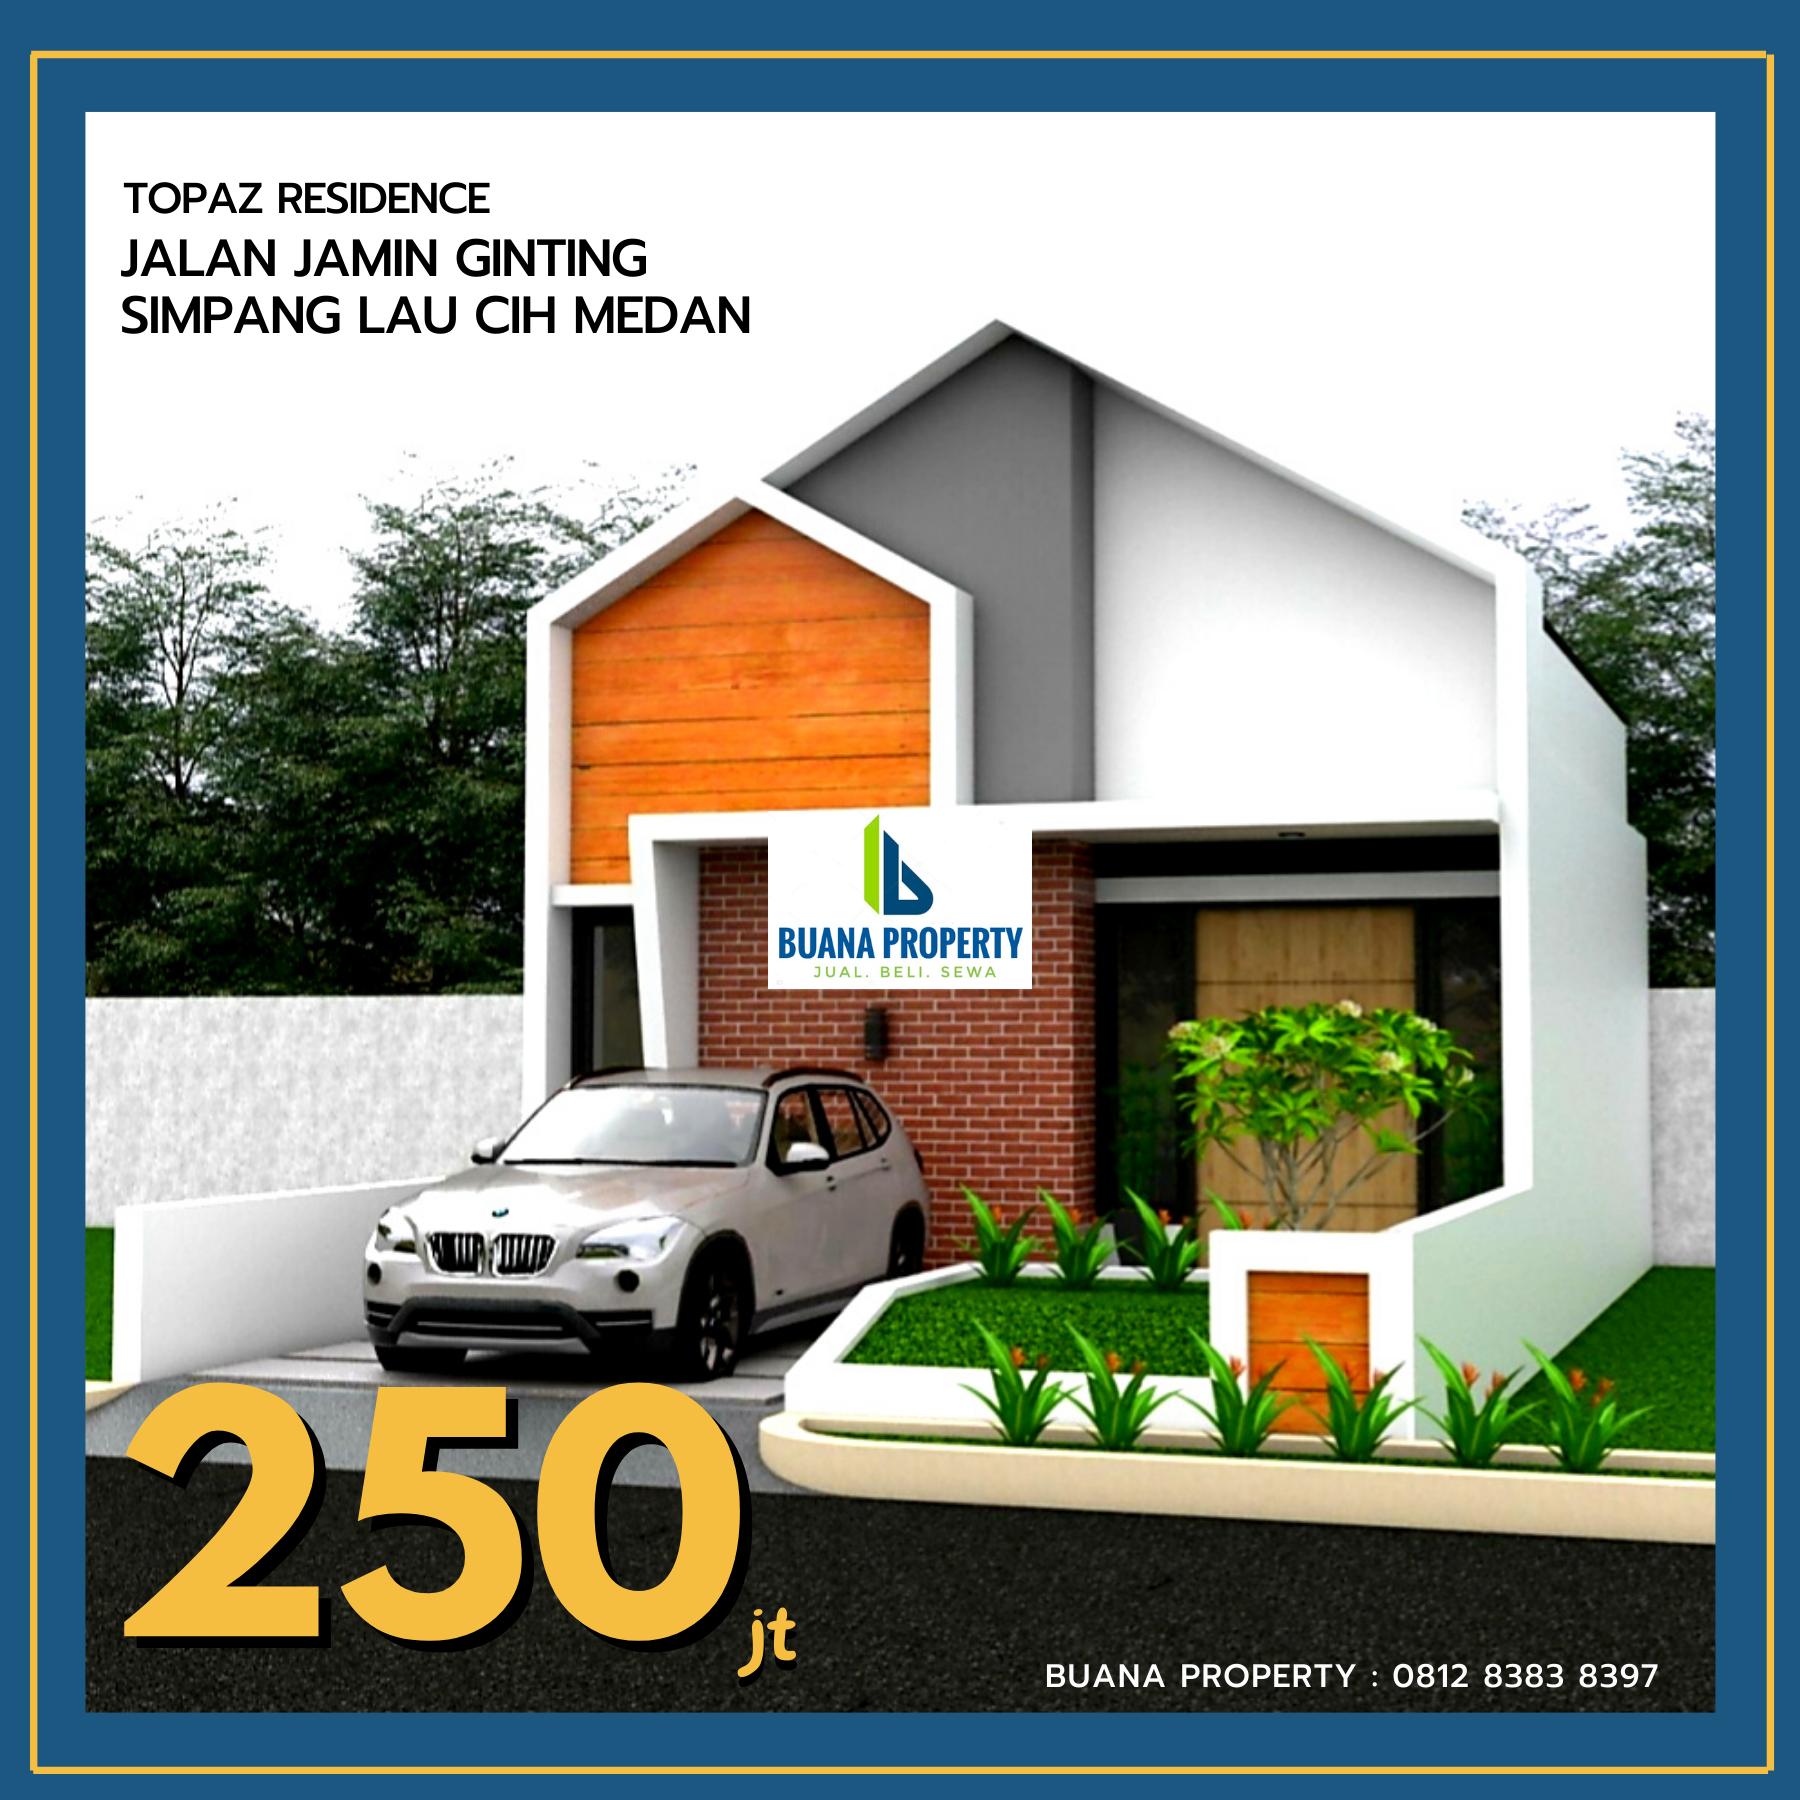 Rumah-200-jutaan-di-pinggir-jalan-besar-Jamin-Ginting-Simpang-Lau-Cih-Medan-Topaz-Residence-BP2